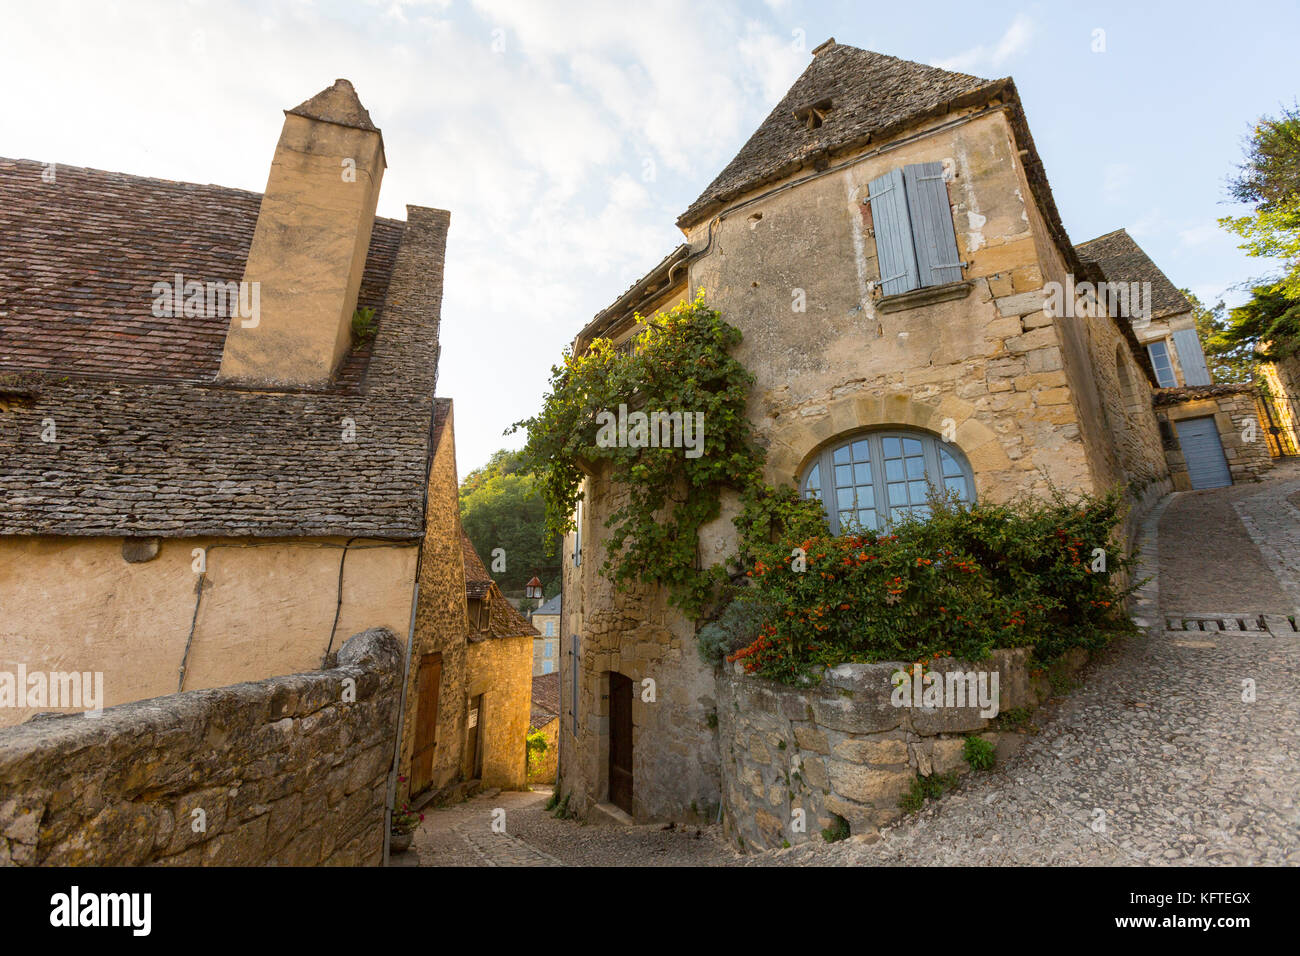 medieval-village-of-beynac-et-cazenac-dordogne-department-france-KFTEGX.jpg